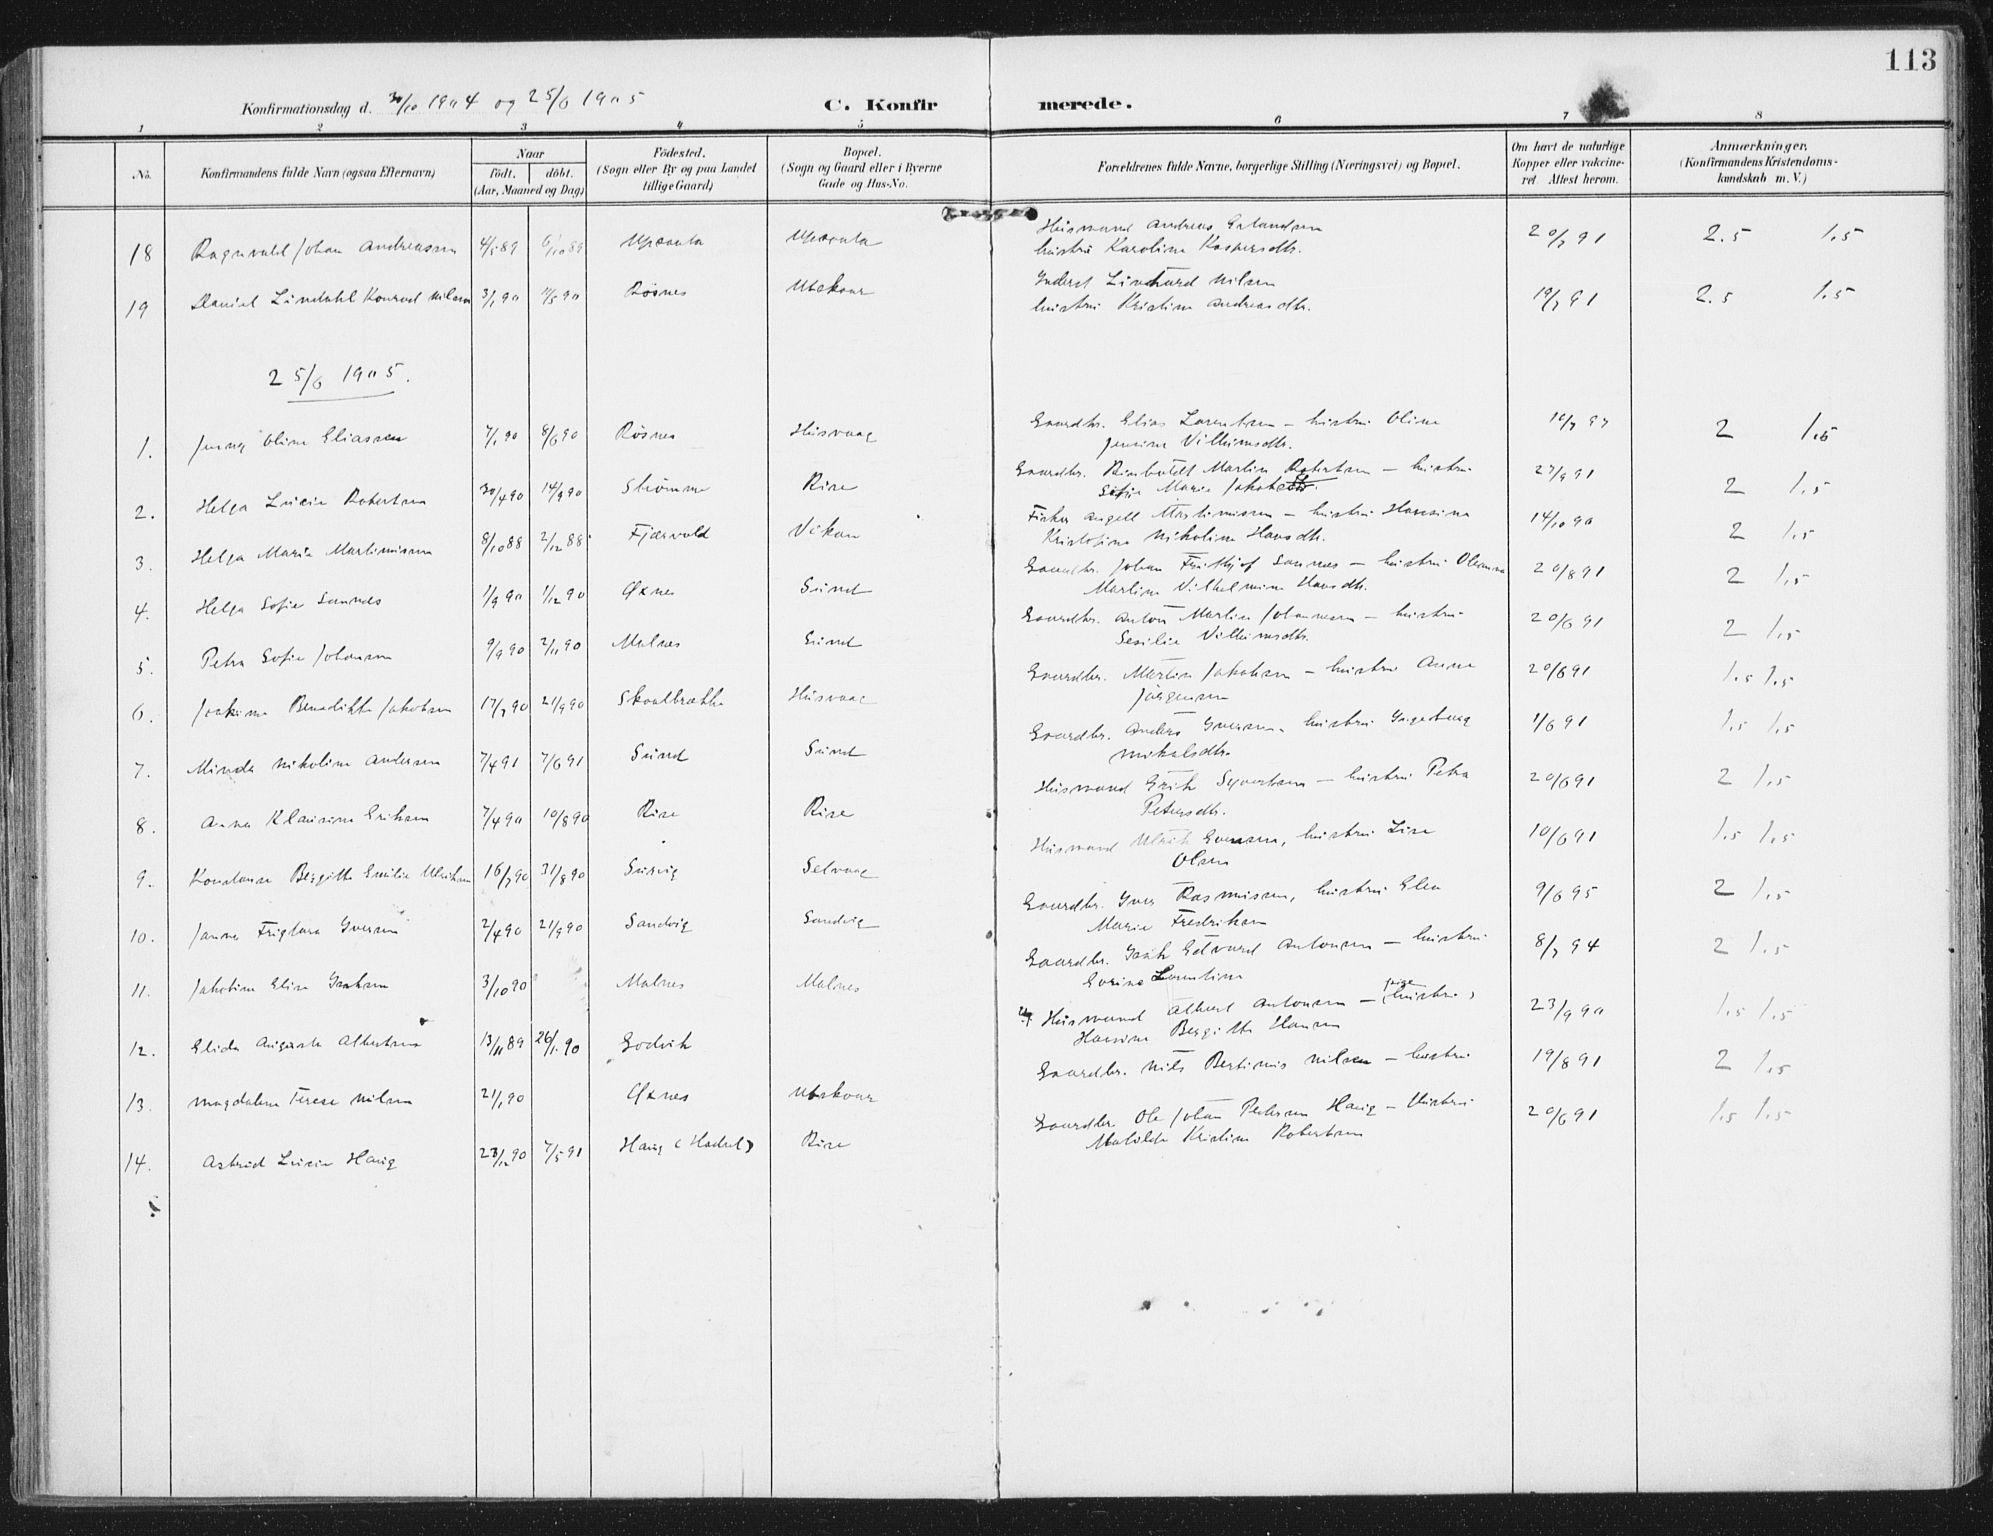 SAT, Ministerialprotokoller, klokkerbøker og fødselsregistre - Nordland, 892/L1321: Ministerialbok nr. 892A02, 1902-1918, s. 113